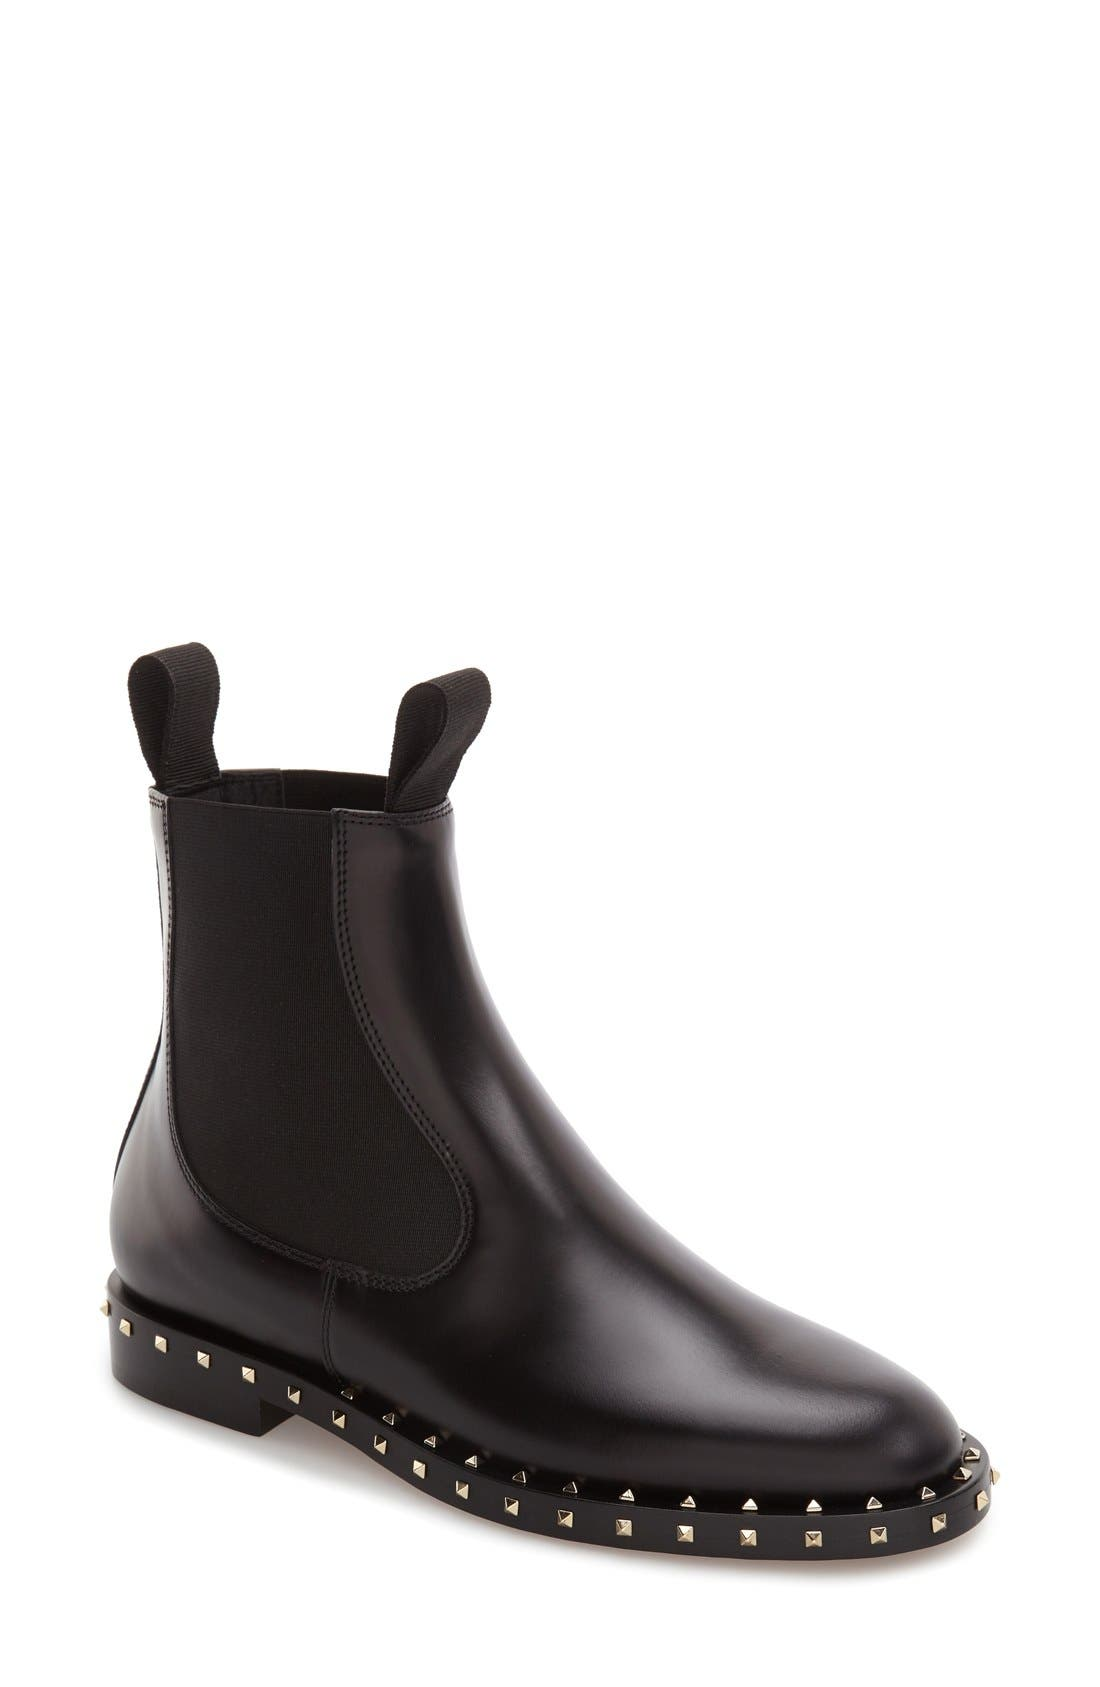 Main Image - Valentino Rockstud Chelsea Boot (Women)